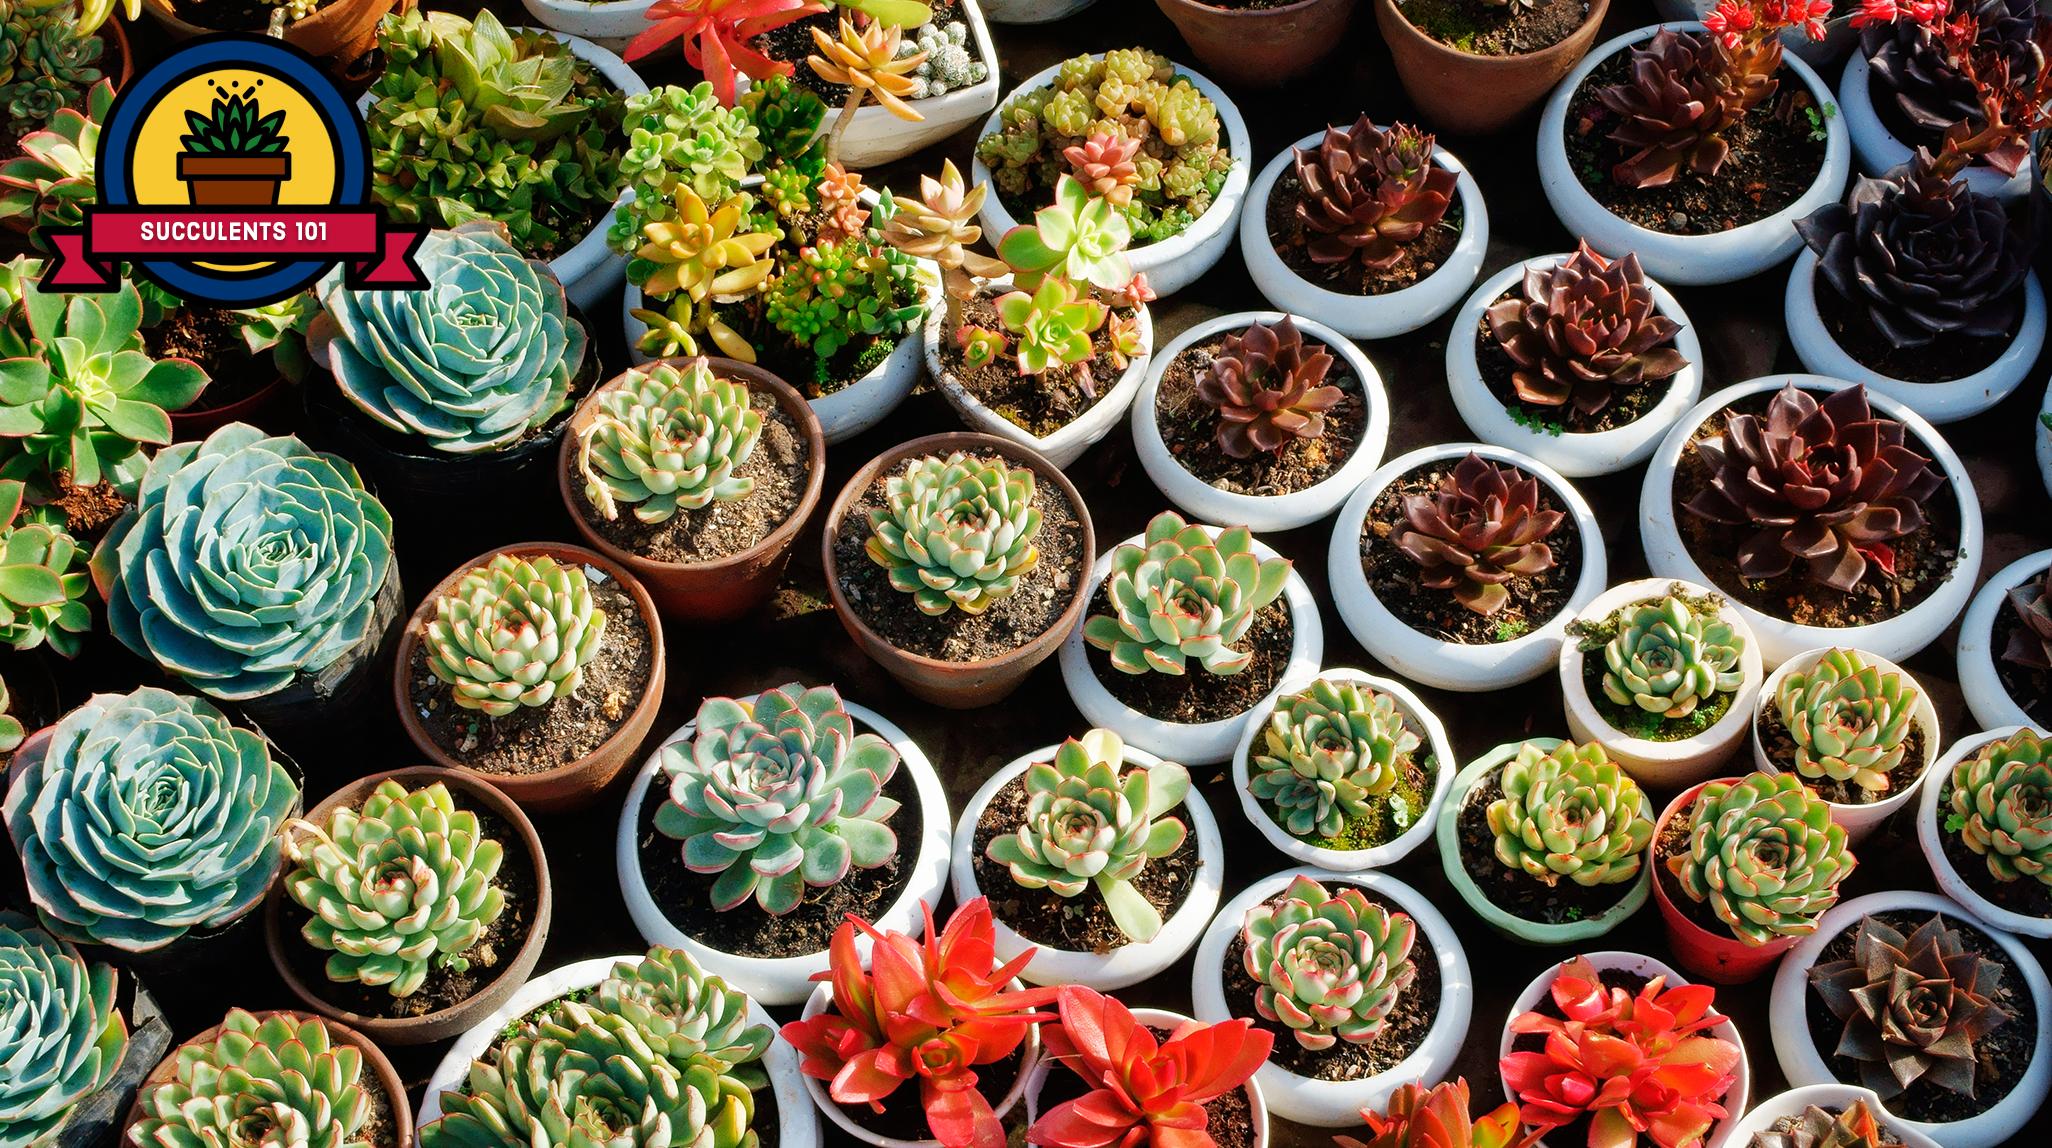 25 succulent plant types different kinds of succulents list. Black Bedroom Furniture Sets. Home Design Ideas